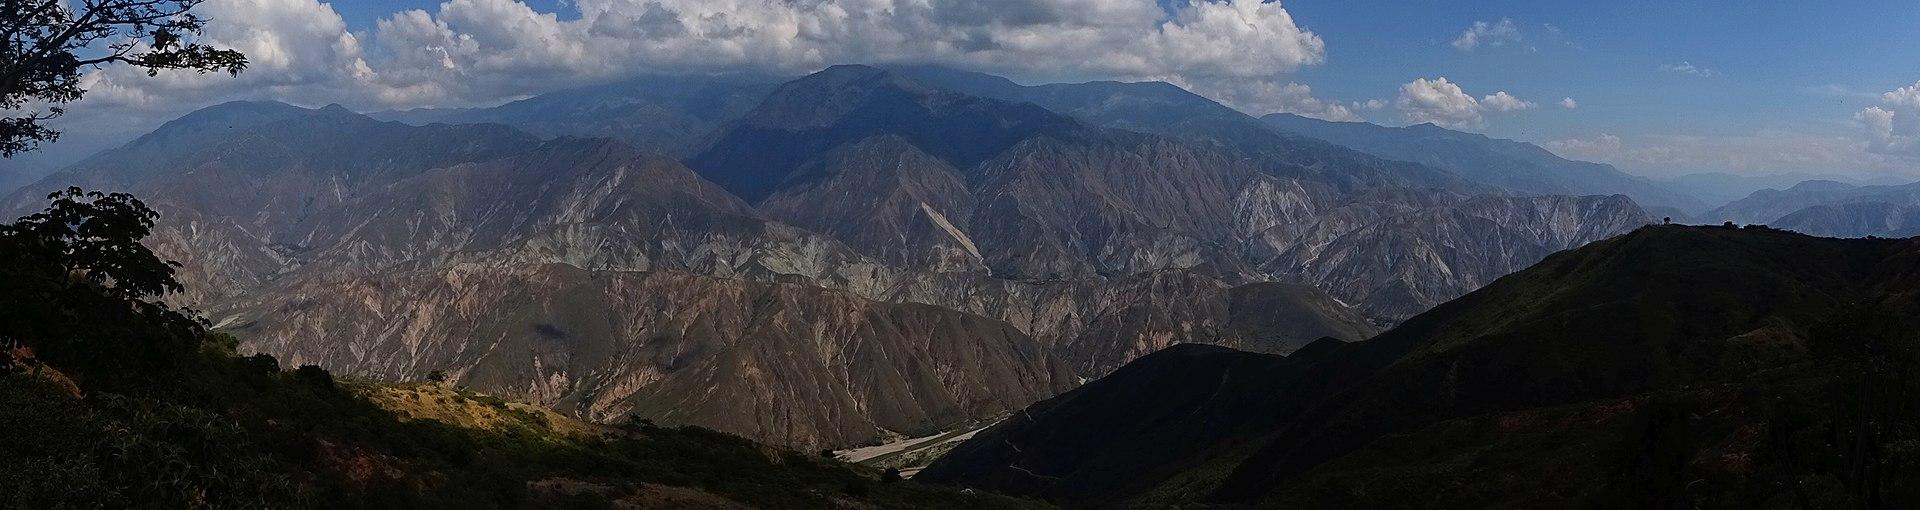 1920px-Panorama_Chicamocha_Canyon%2C_Santander.jpg